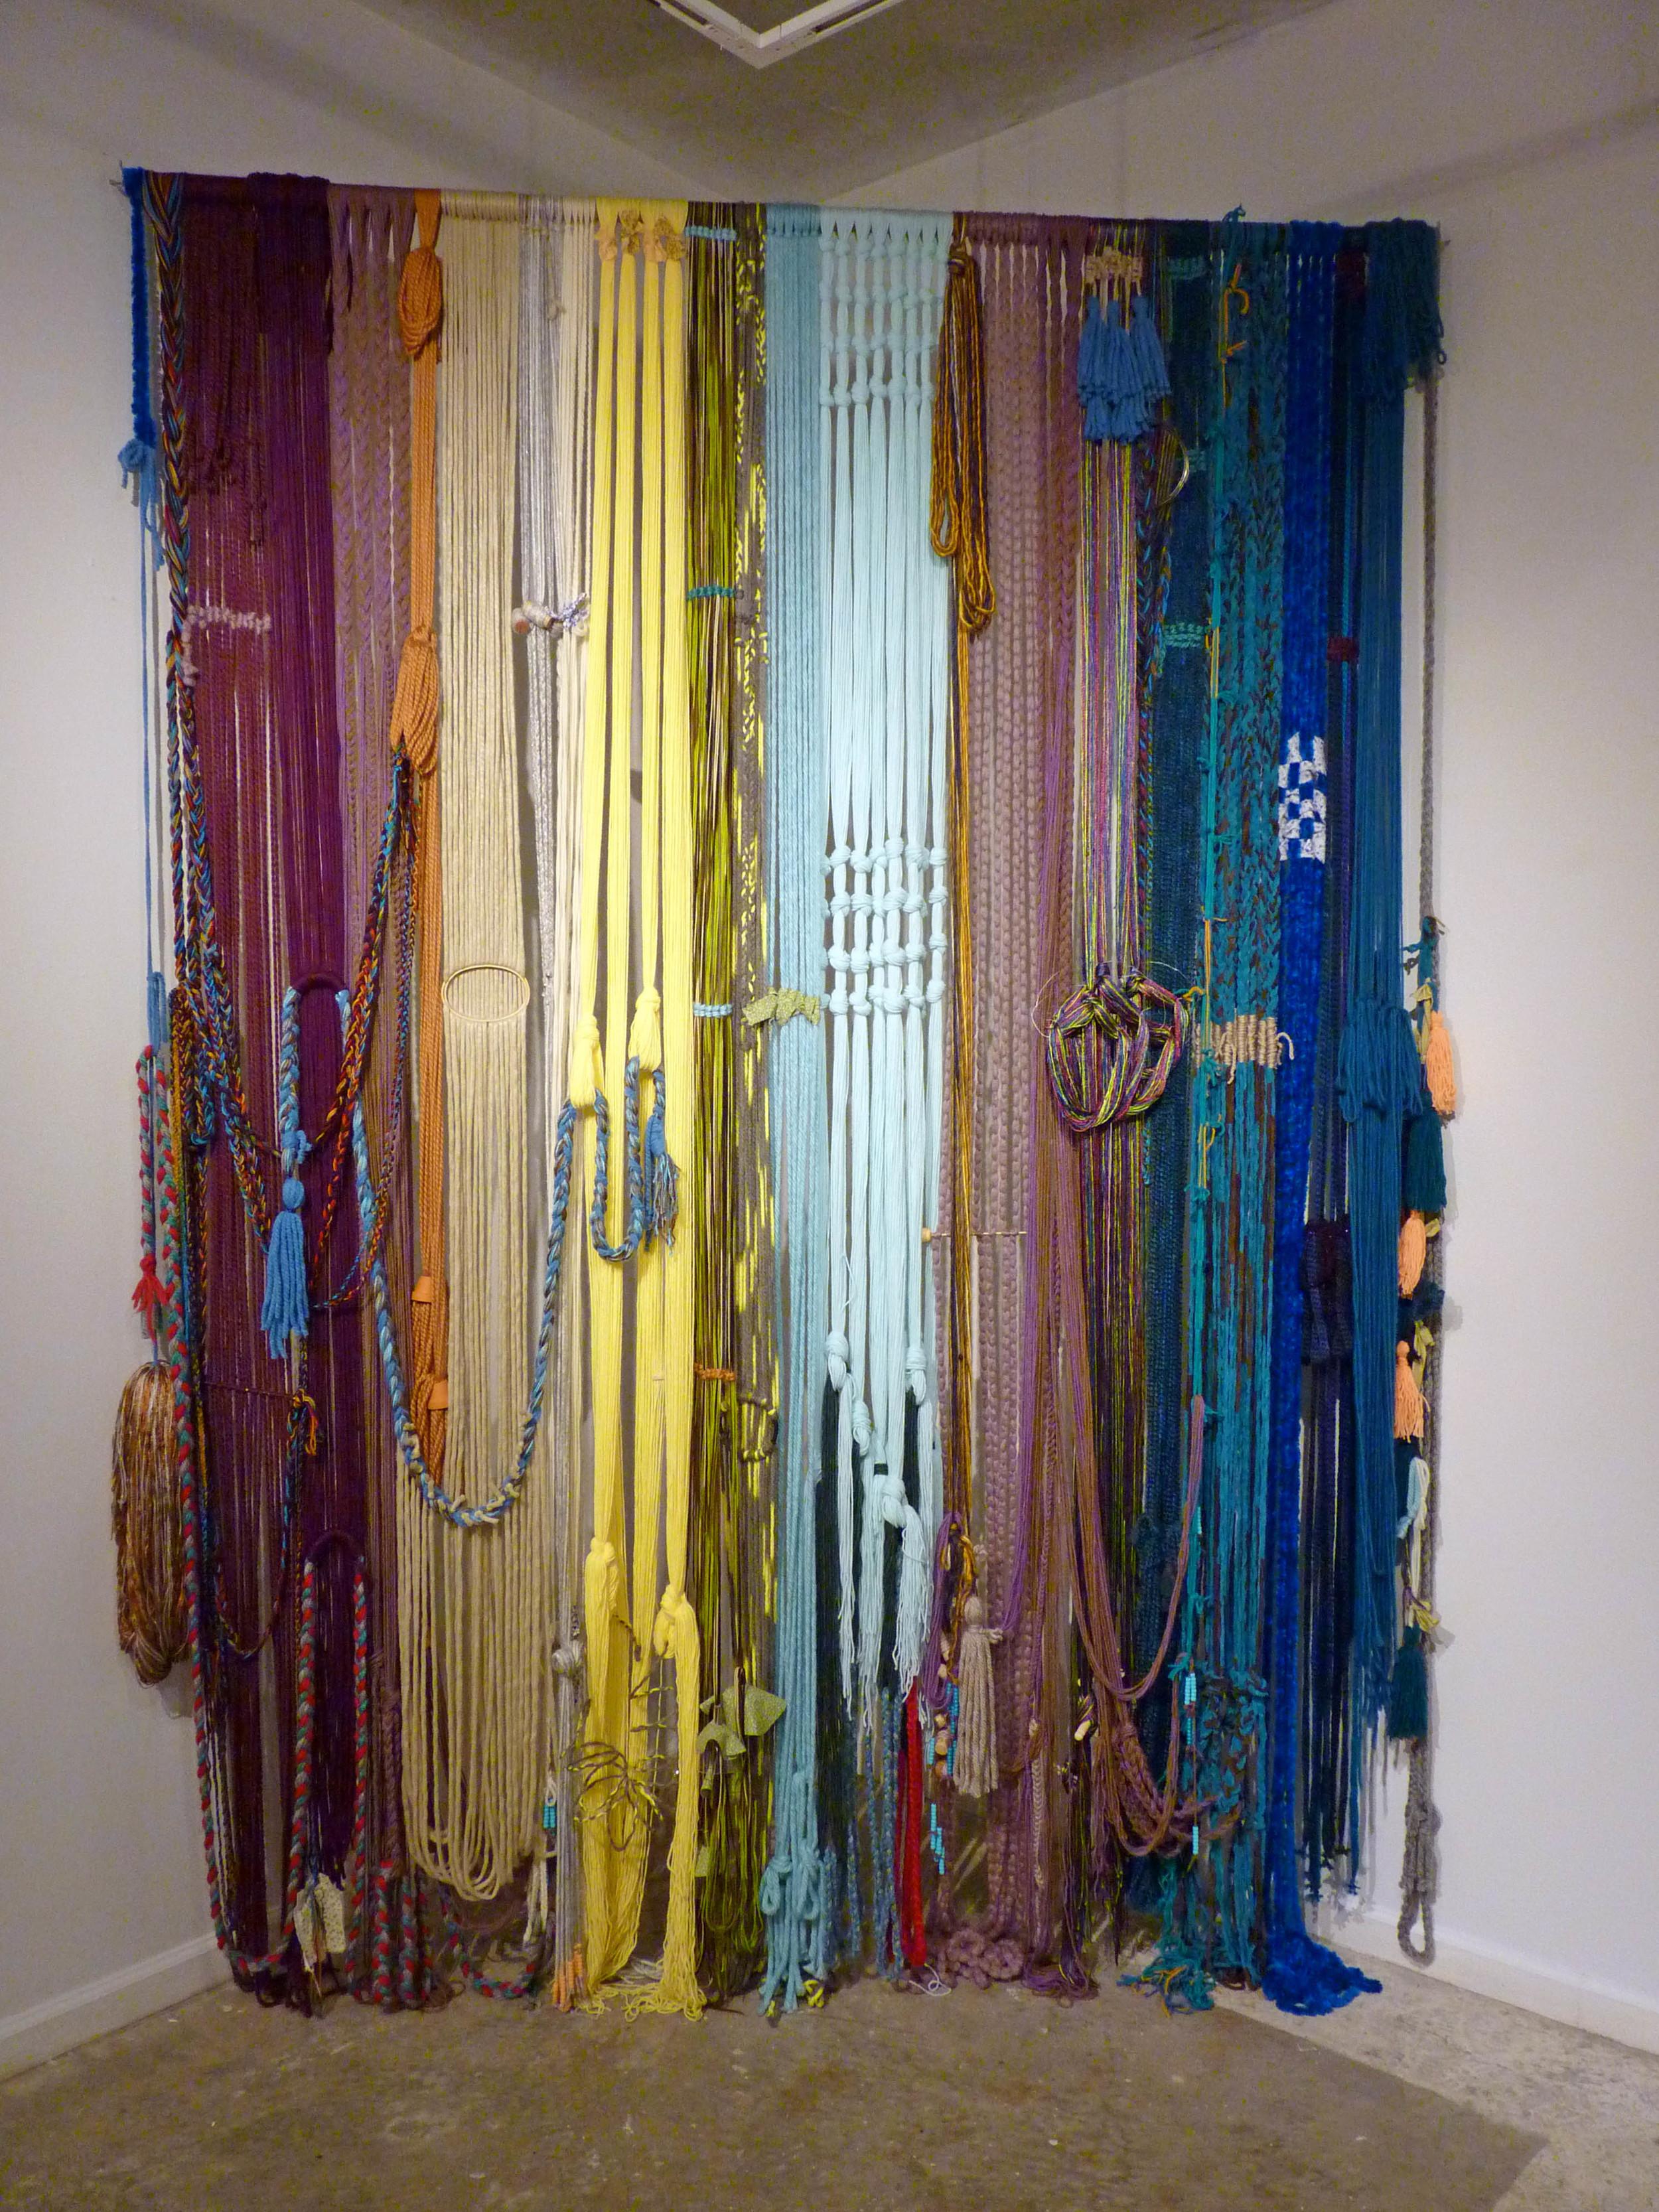 Teen Baleen (Corset), 2015, Yarn with fabric, wood and metal, 7' x 4' x 11'